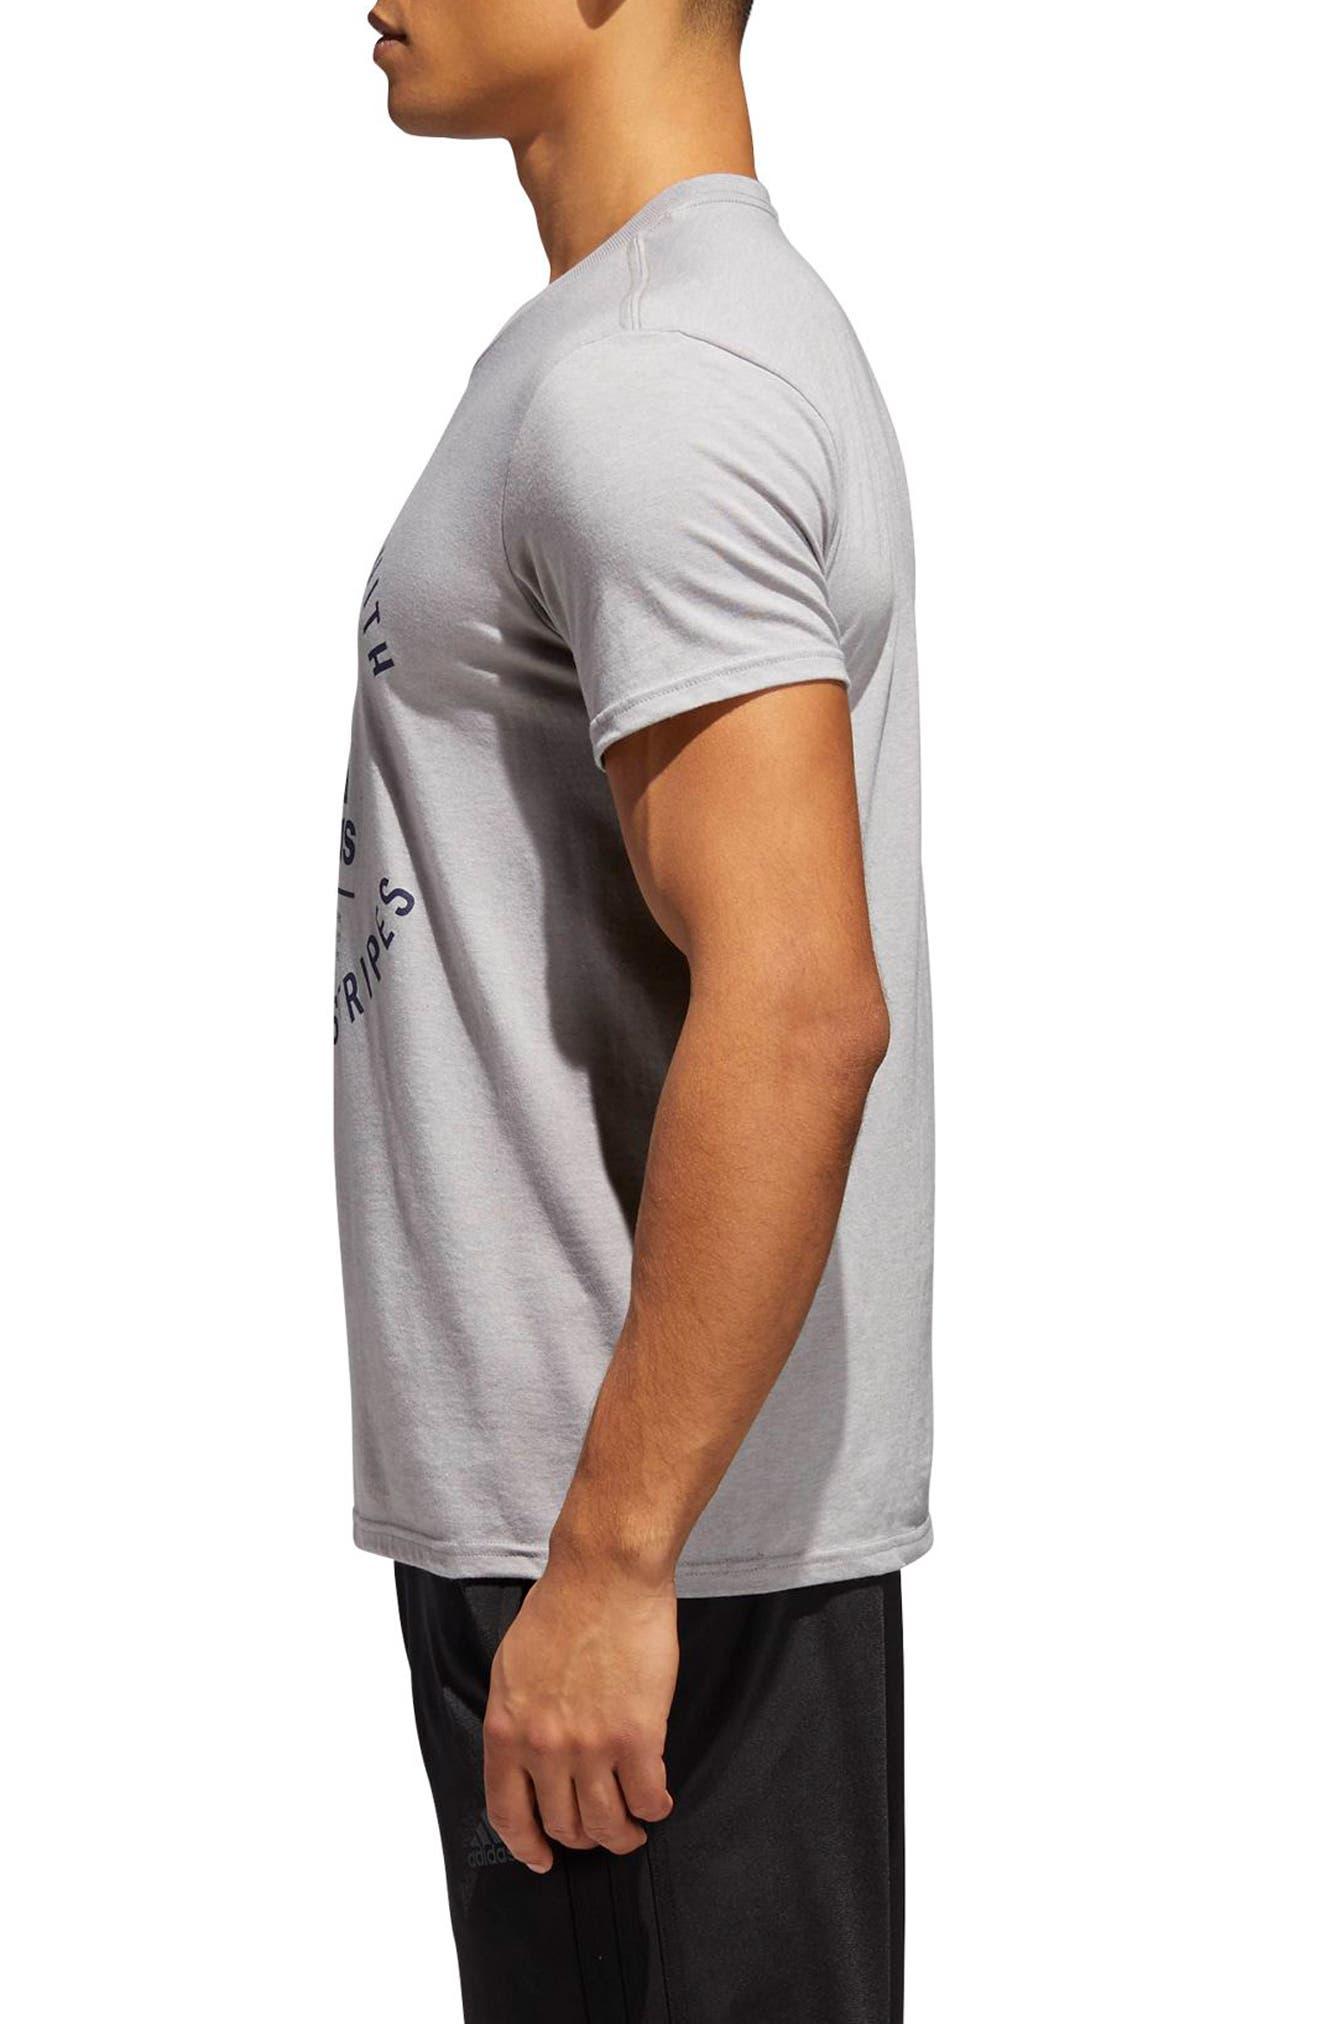 TSL Emblem T-Shirt,                             Alternate thumbnail 2, color,                             Grey Heather / Collegiate Navy